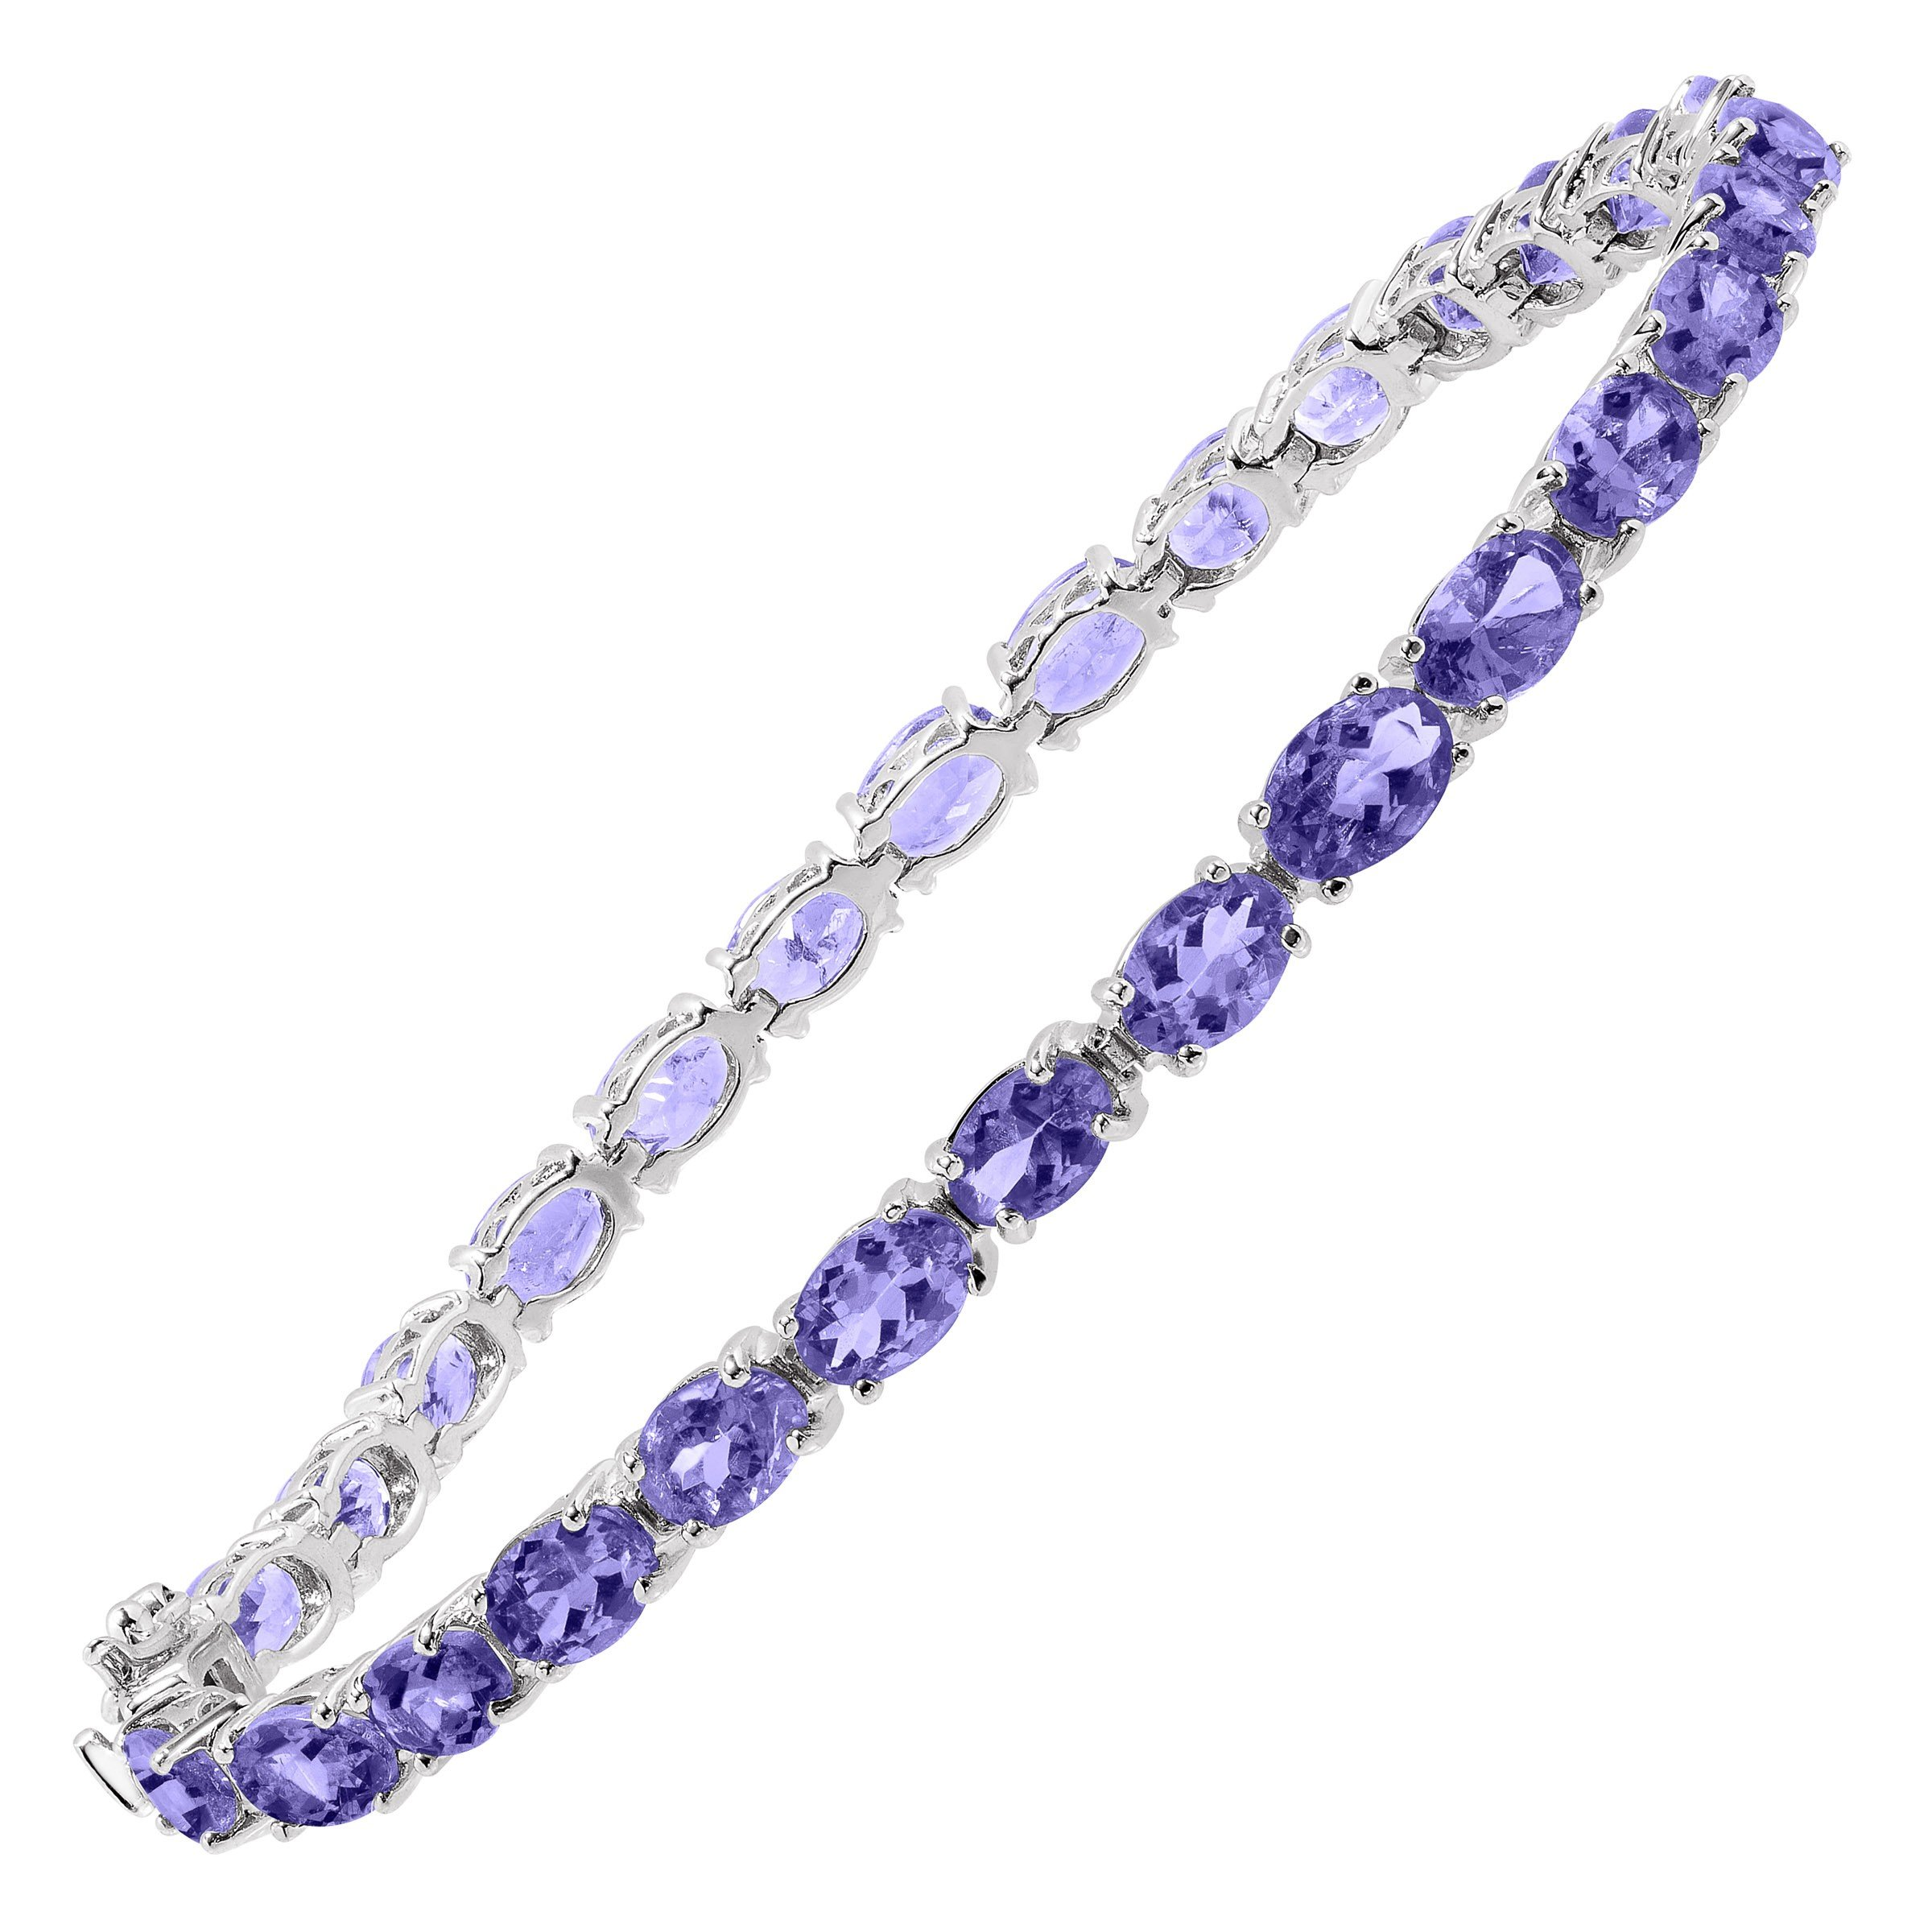 13 ct Natural Tanzanite Tennis Bracelet in Sterling Silver, 7.5''